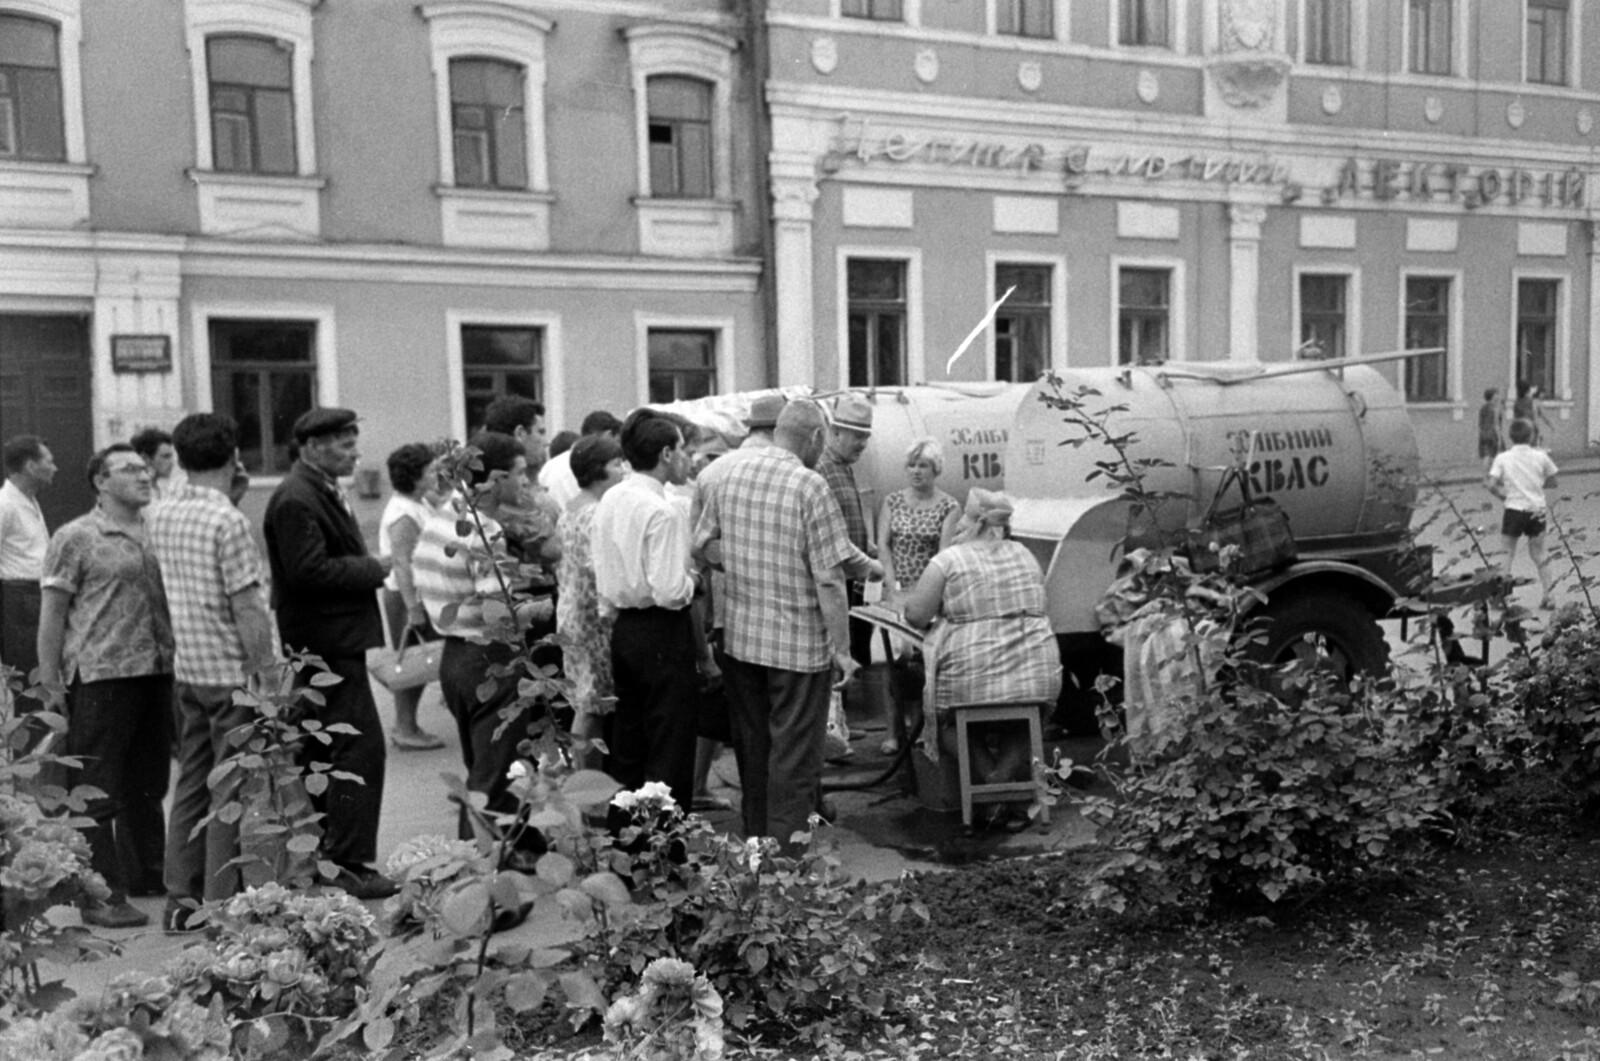 1968. Кировоград. Улица Архитектора Пайченко